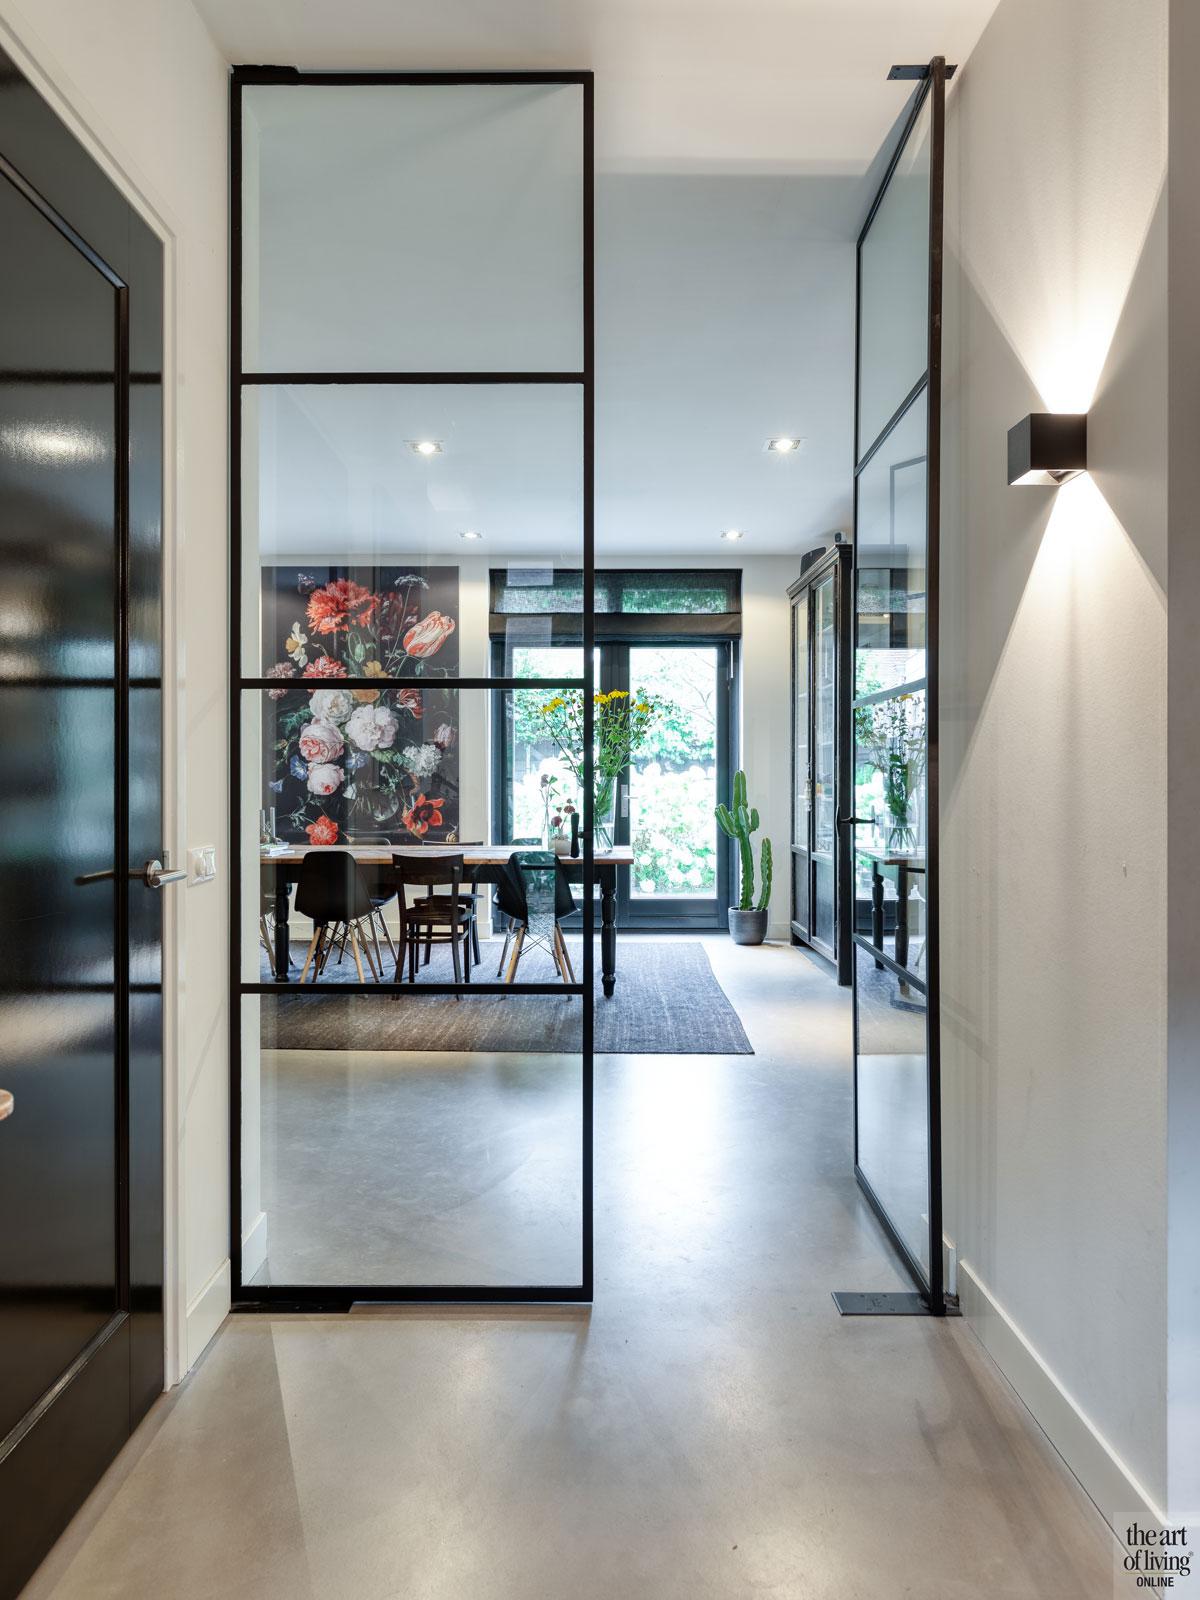 Stalen deuren, Stalendeurenhuys, Stalen deur, Industrieel interieur, Strak interieur, Warm interieur, Stoer interieur